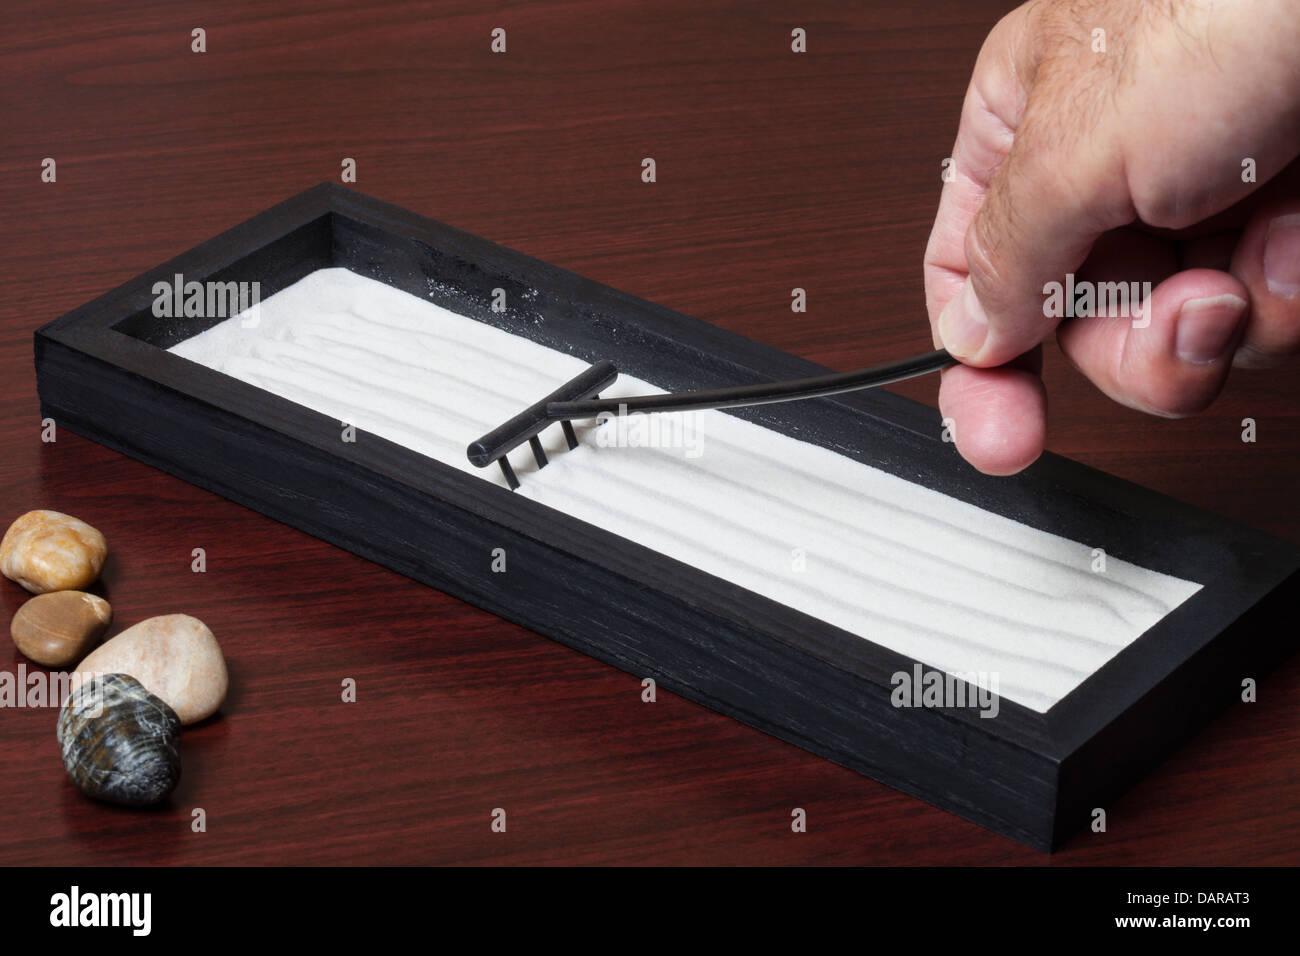 Man Raking Sand In A Miniature Table Top Zen Garden